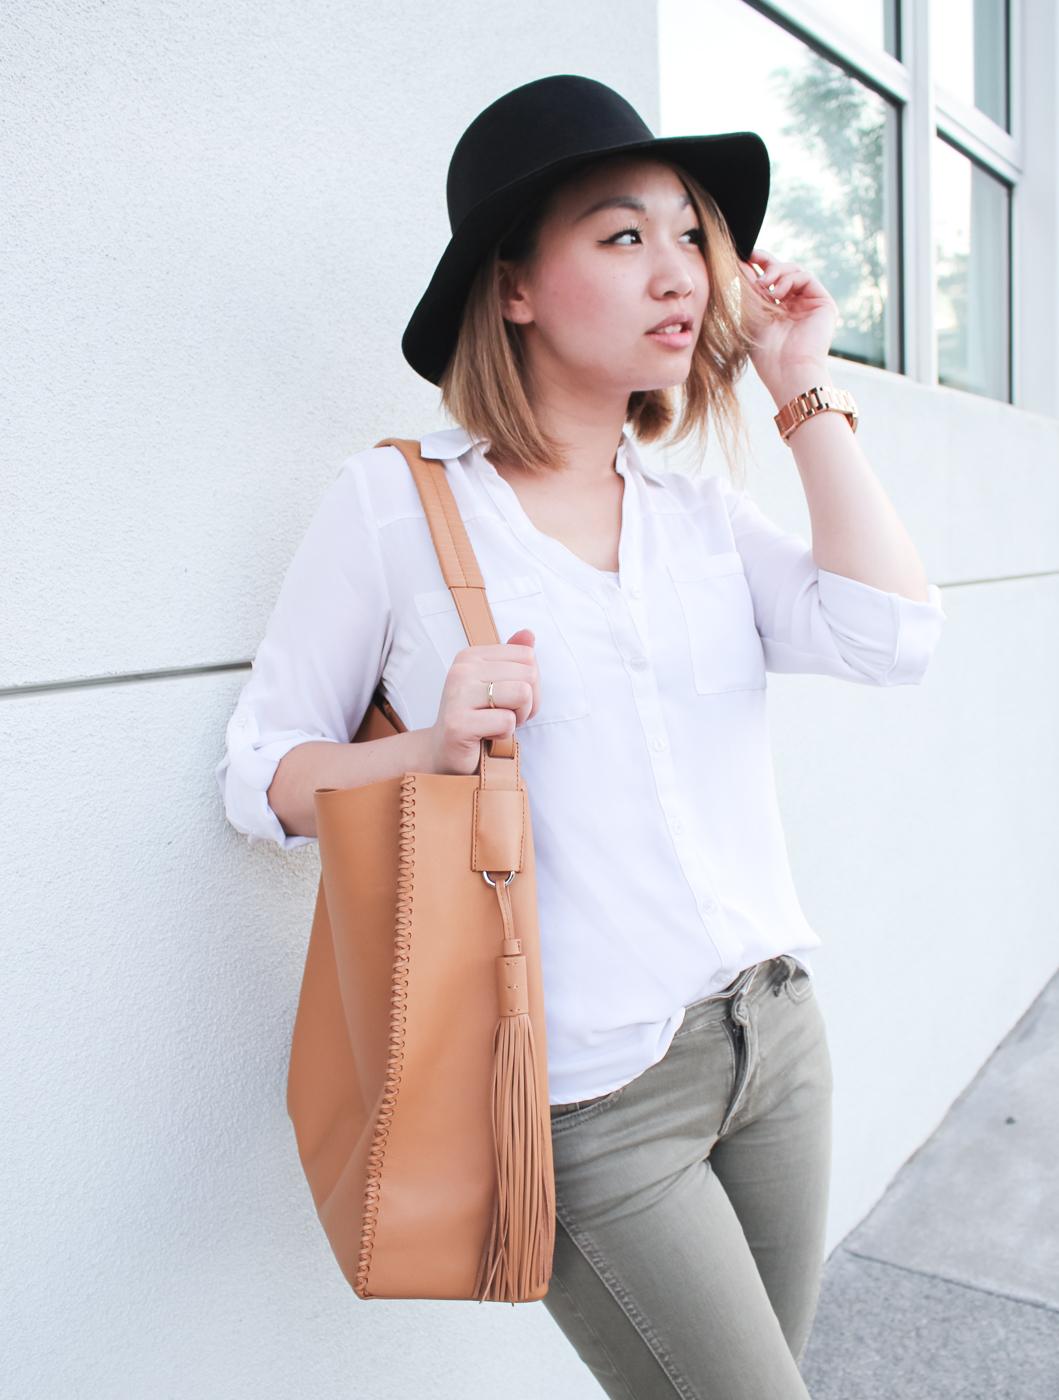 Express Portofino Shirt | The Chic Diary